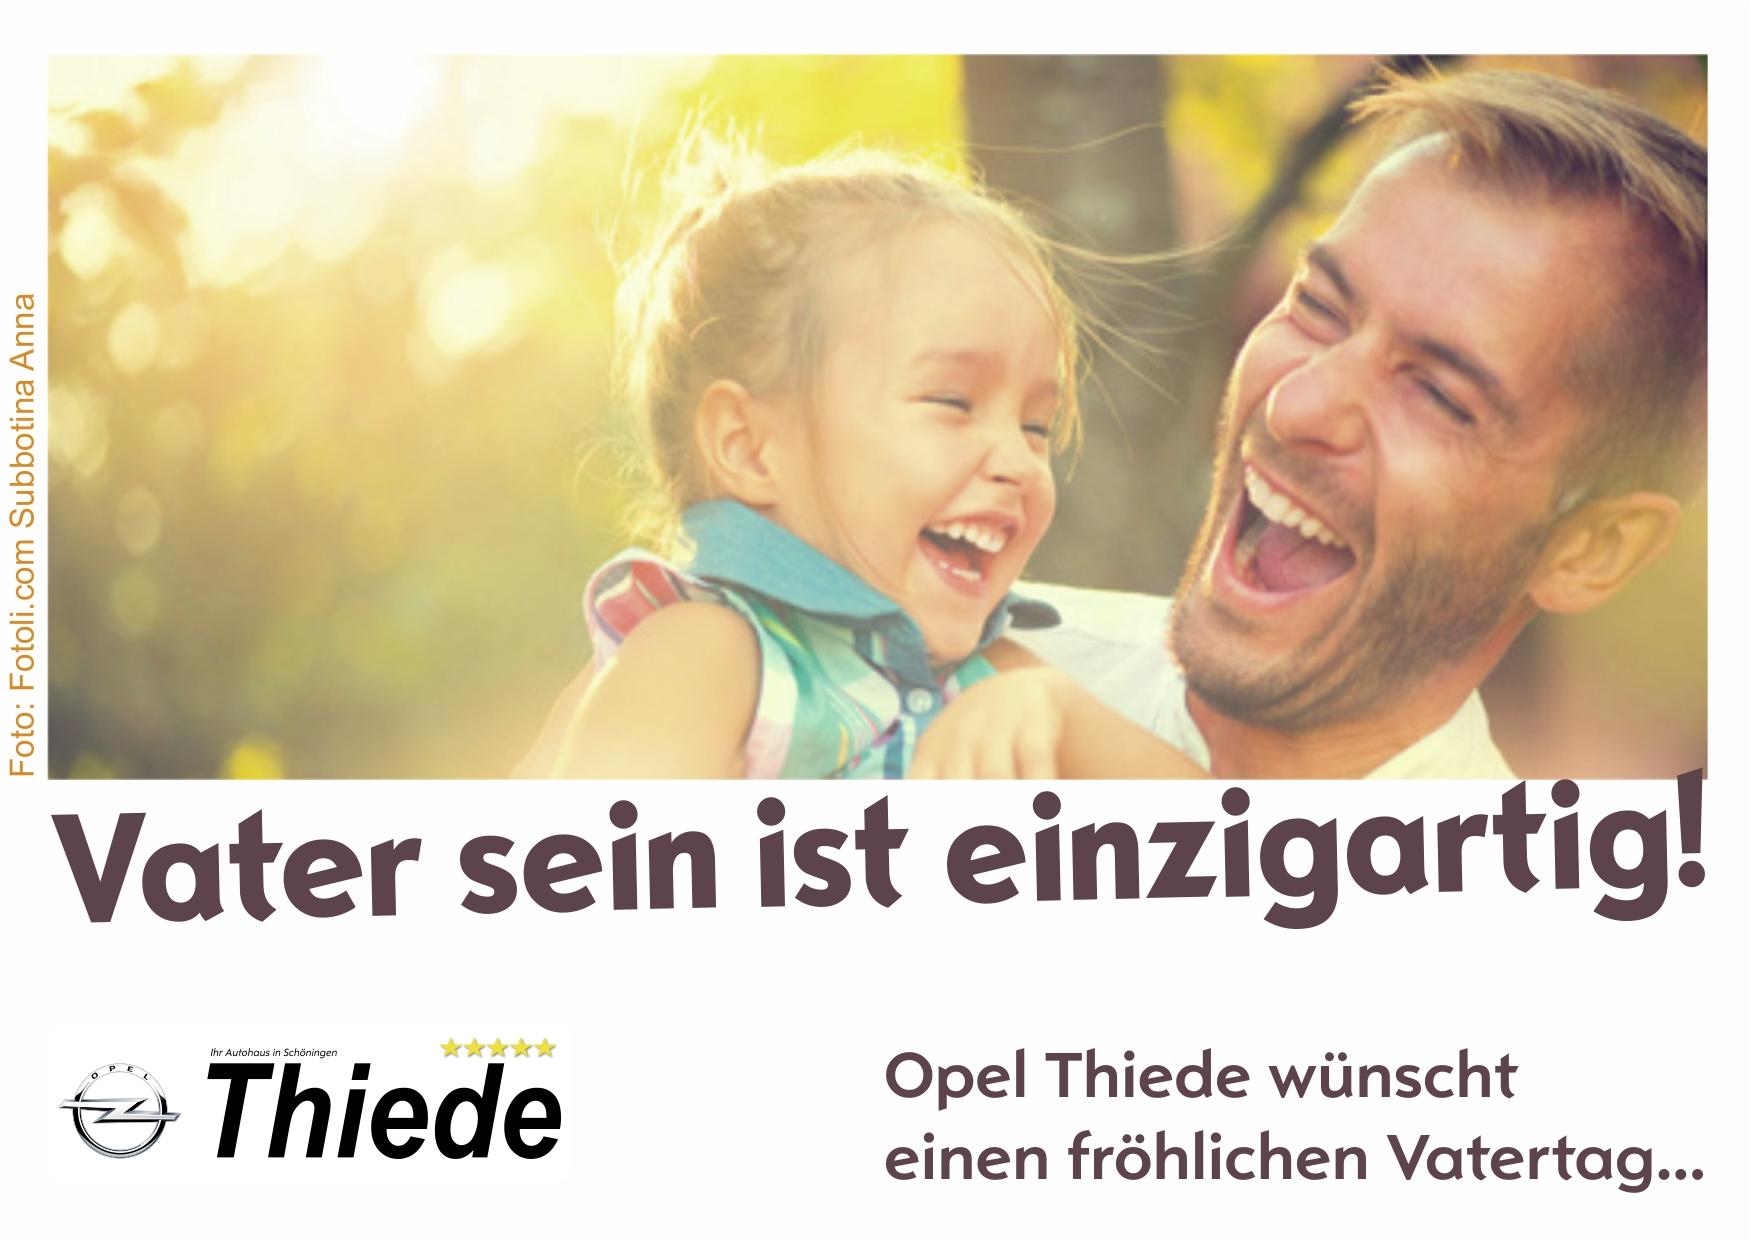 Opel-Väter-Kinder-Familien-Autohaus-Thiede